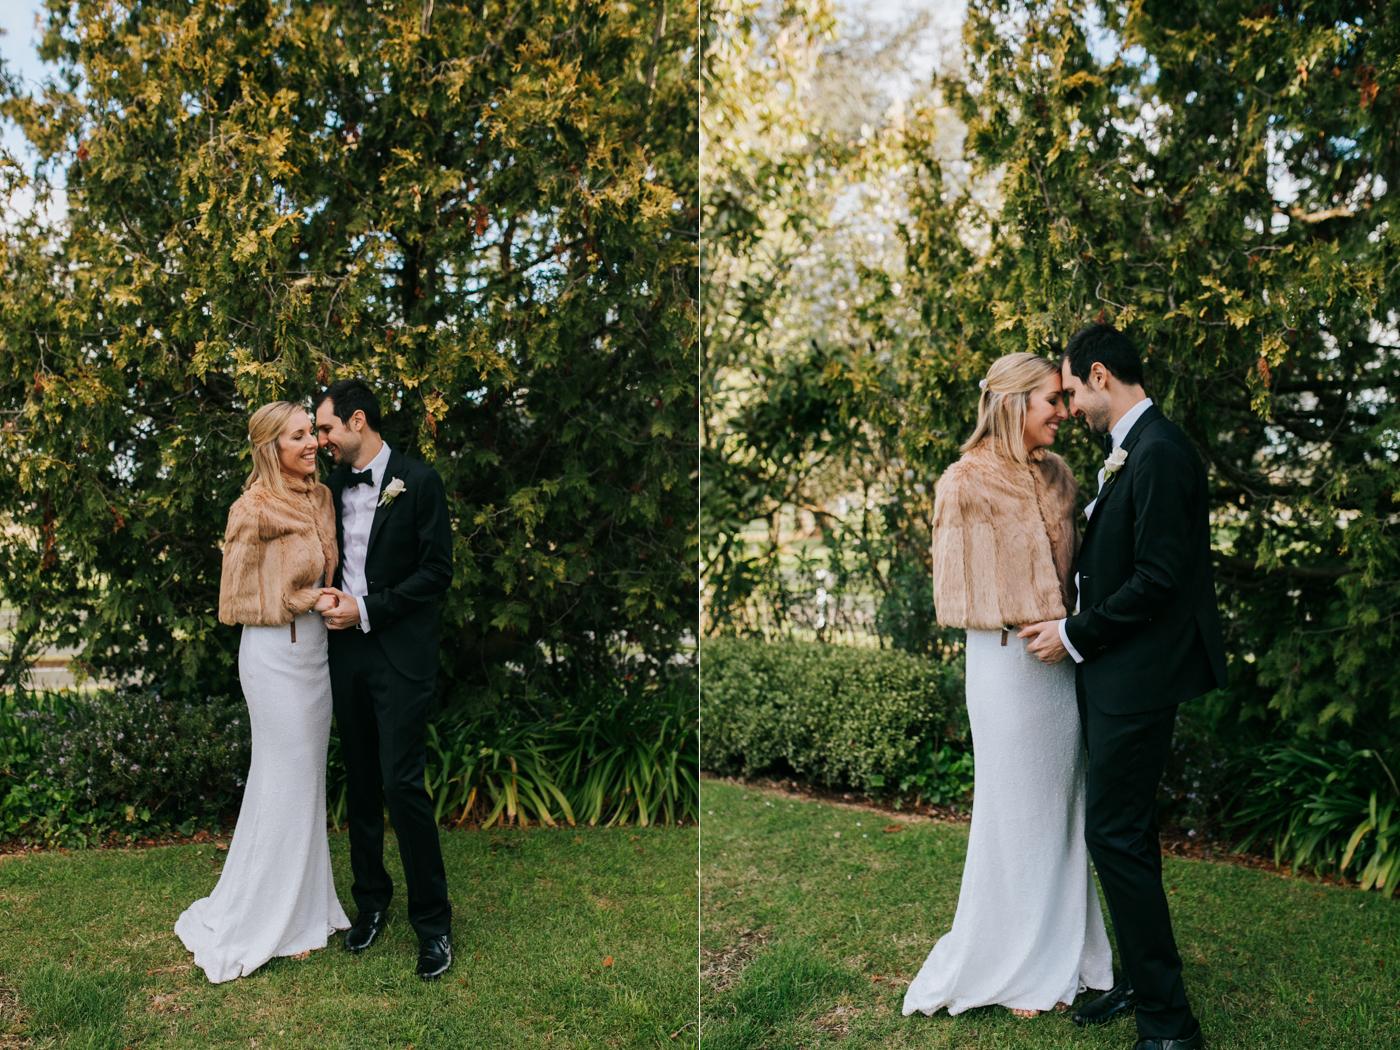 Bridget & James - Orange Country Wedding - Samantha Heather Photography-166.jpg